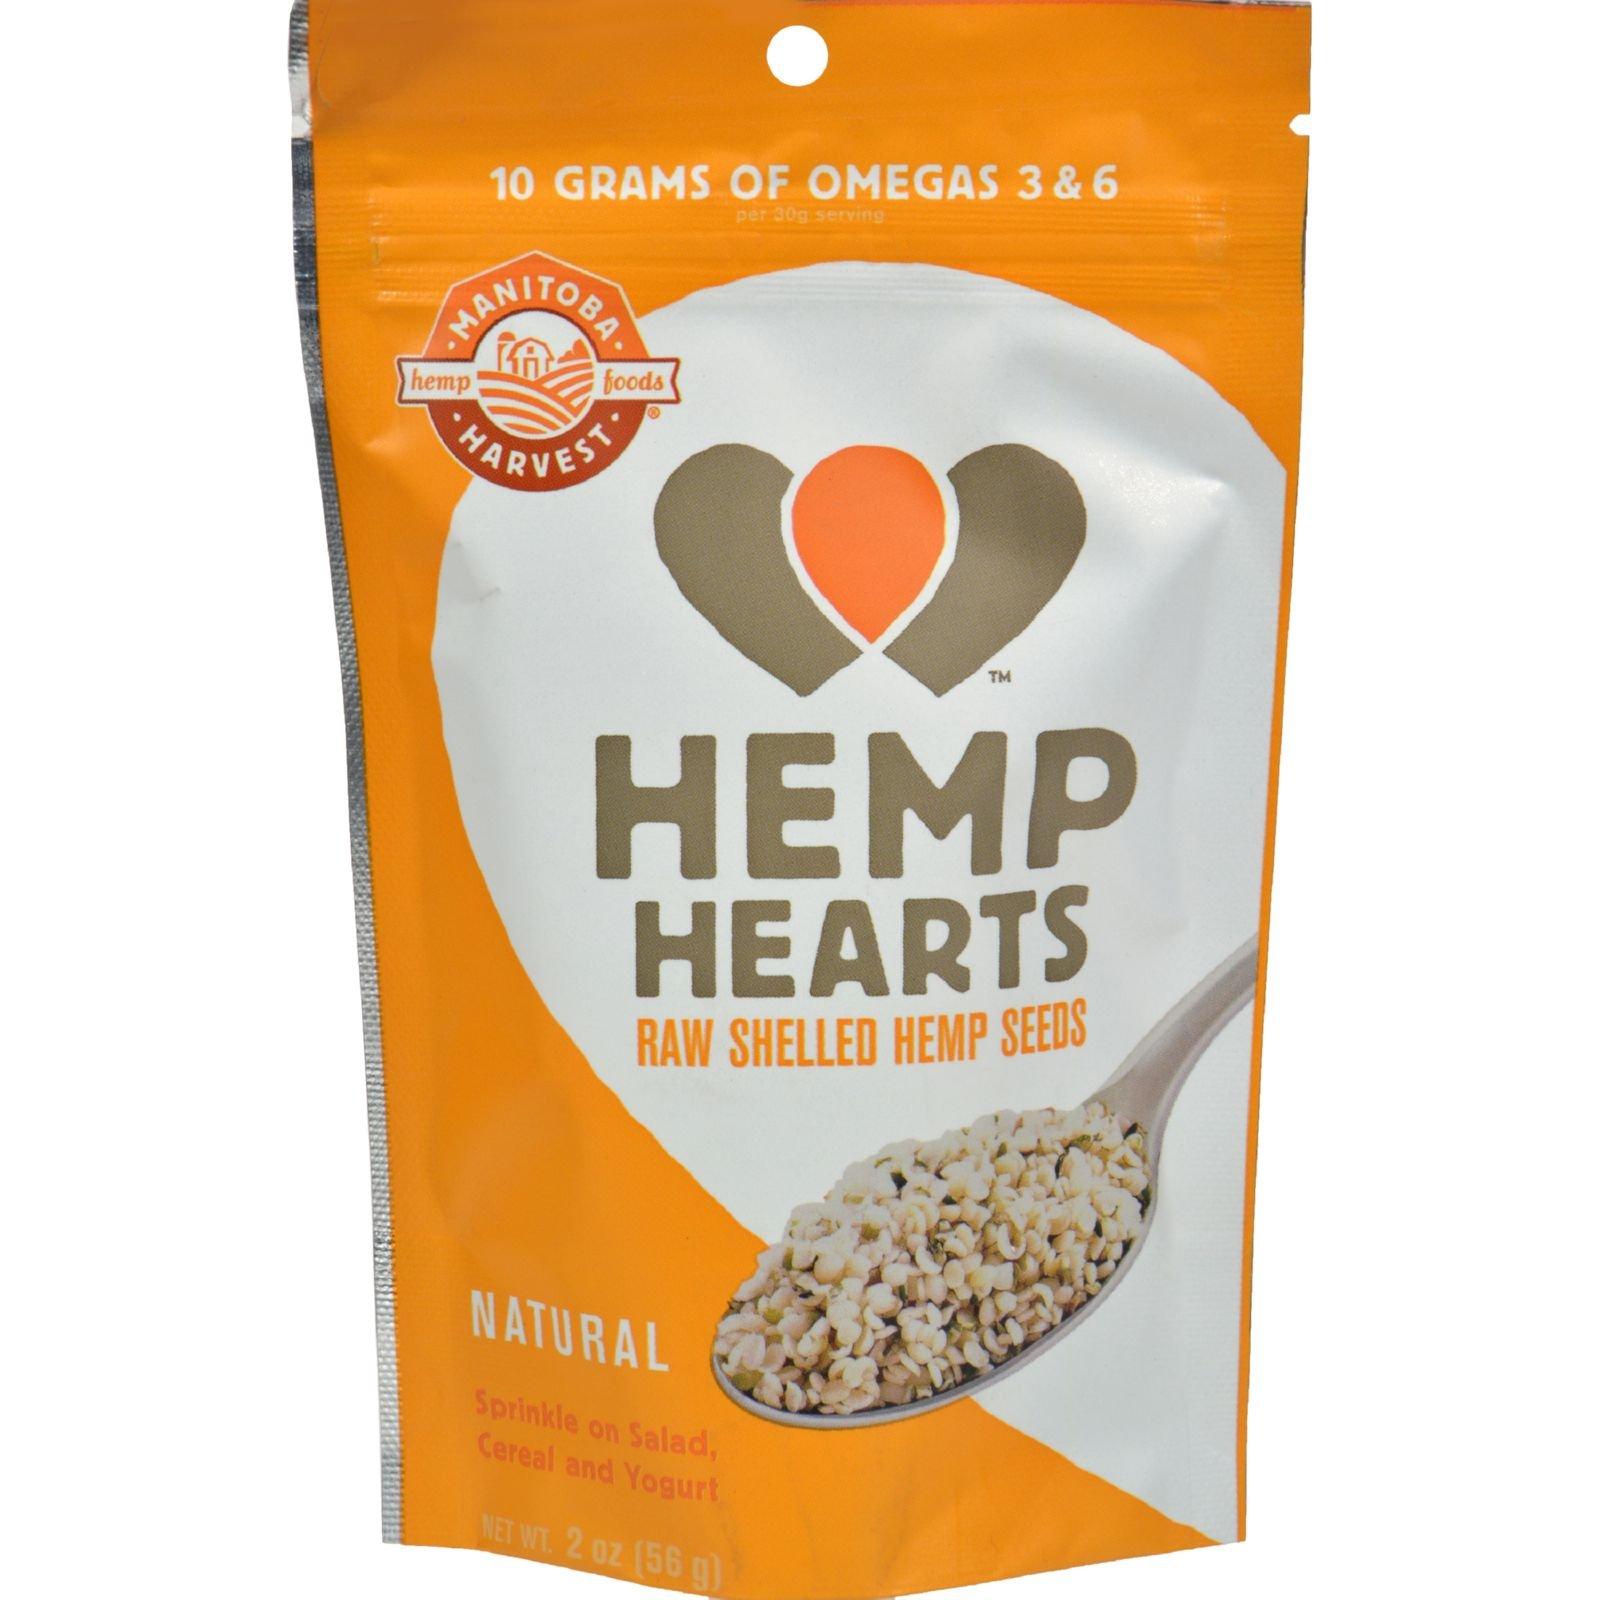 Manitoba Harvest Natural Hemp Hearts - Case of 12-2 oz